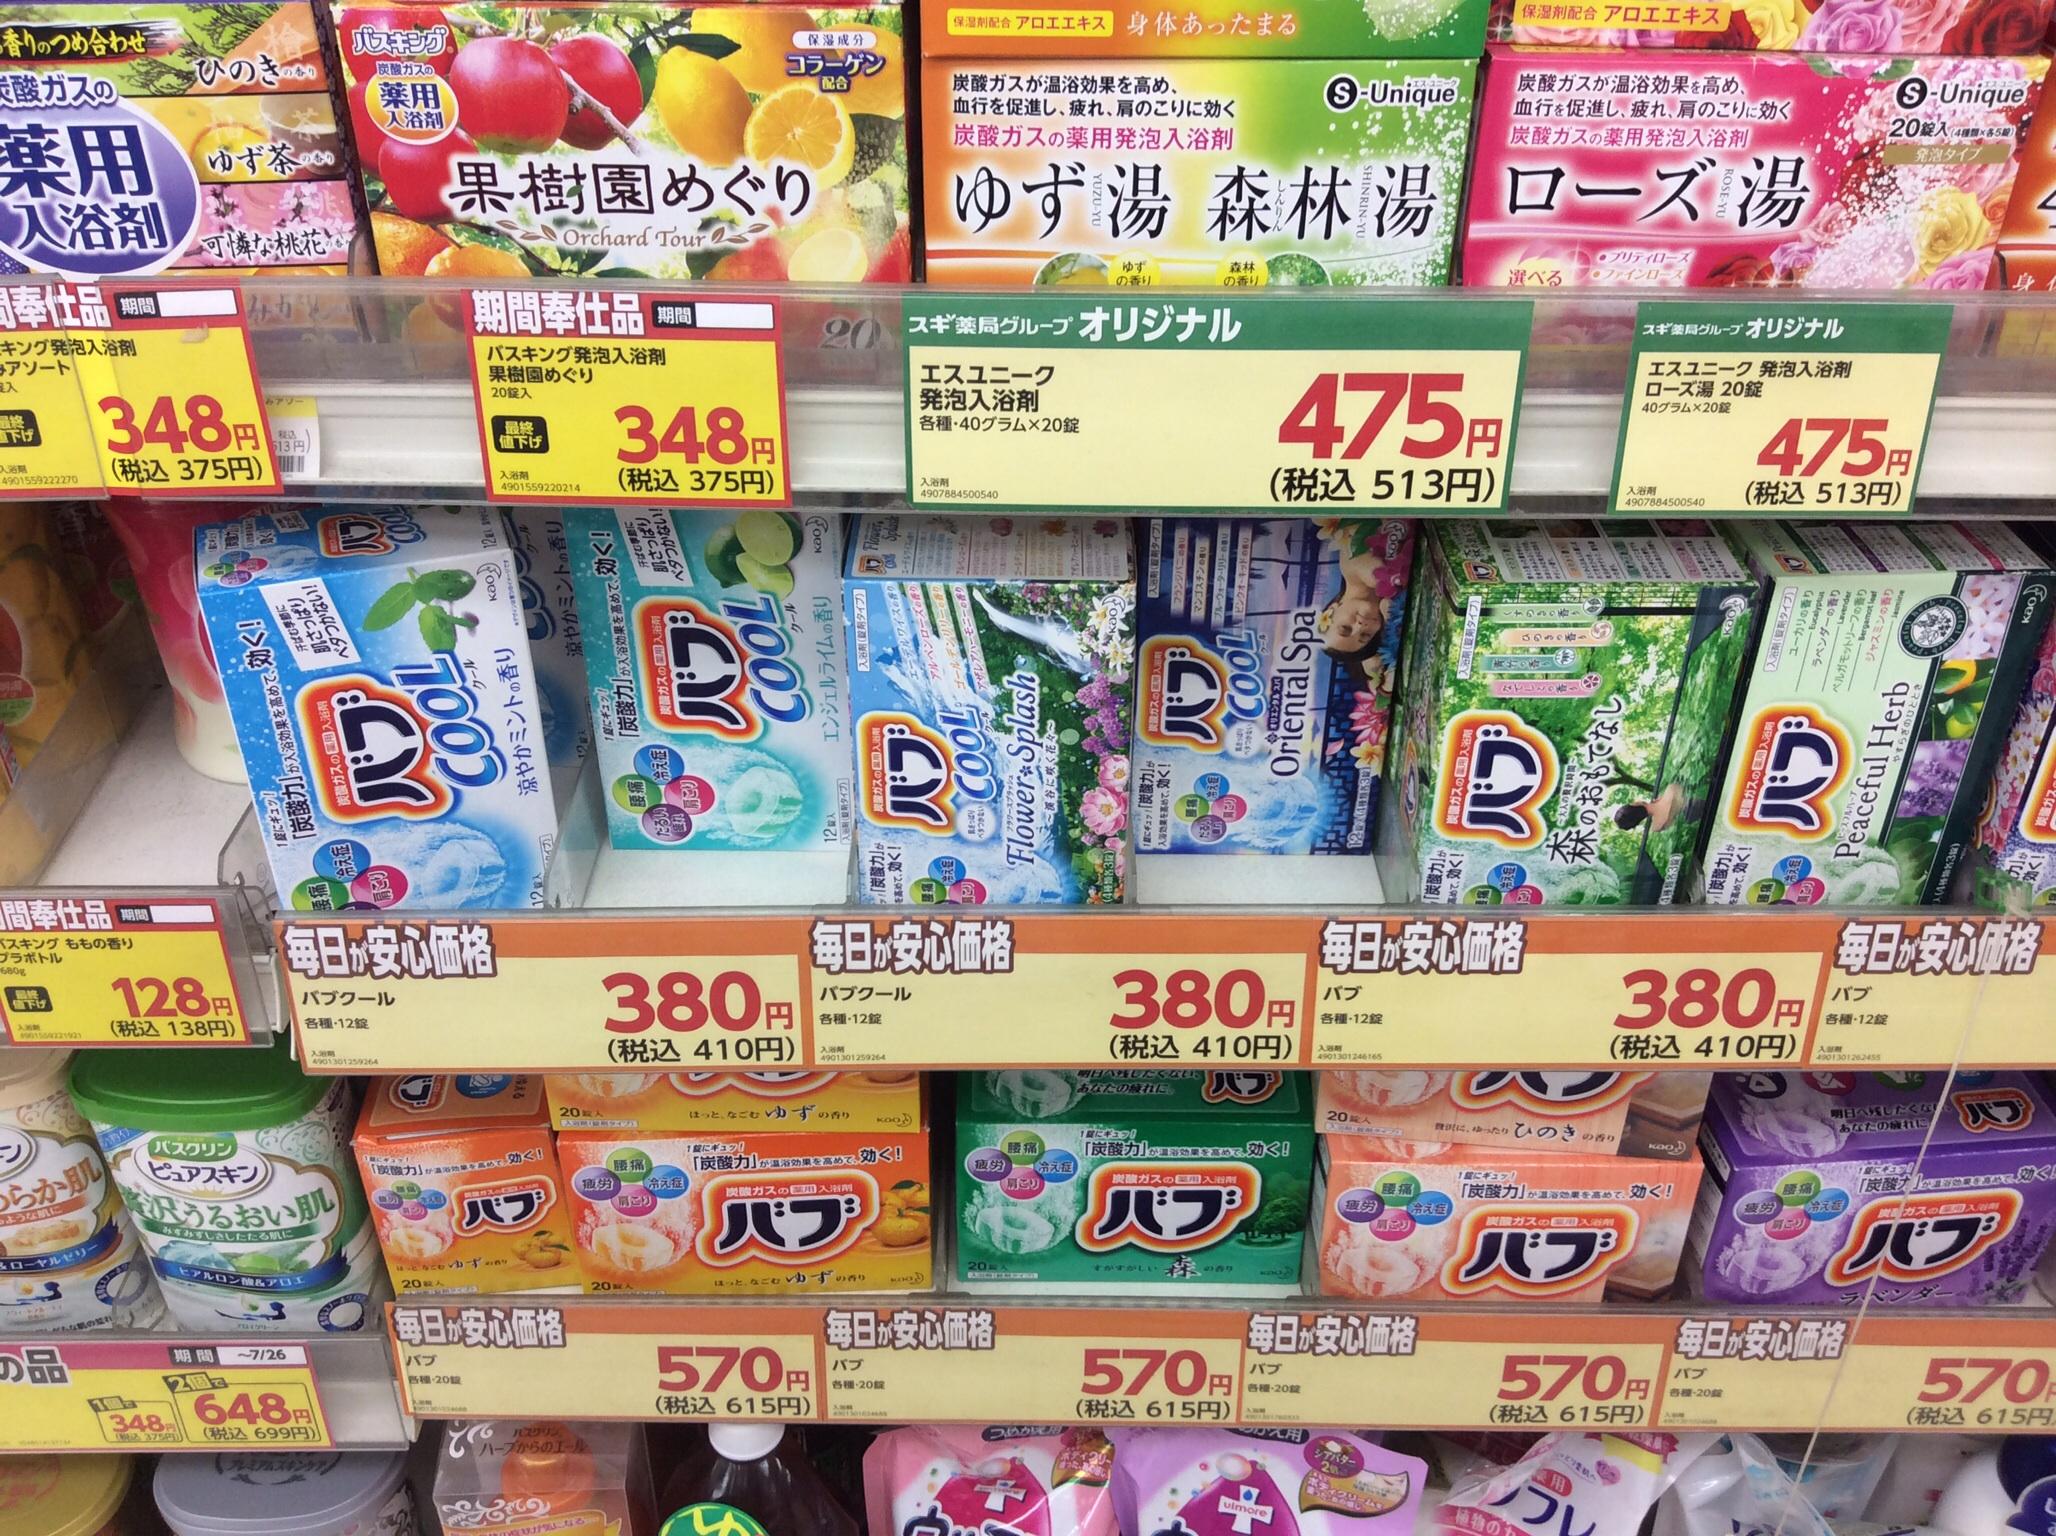 Enjoy bath, Japanese style - DeepJapan